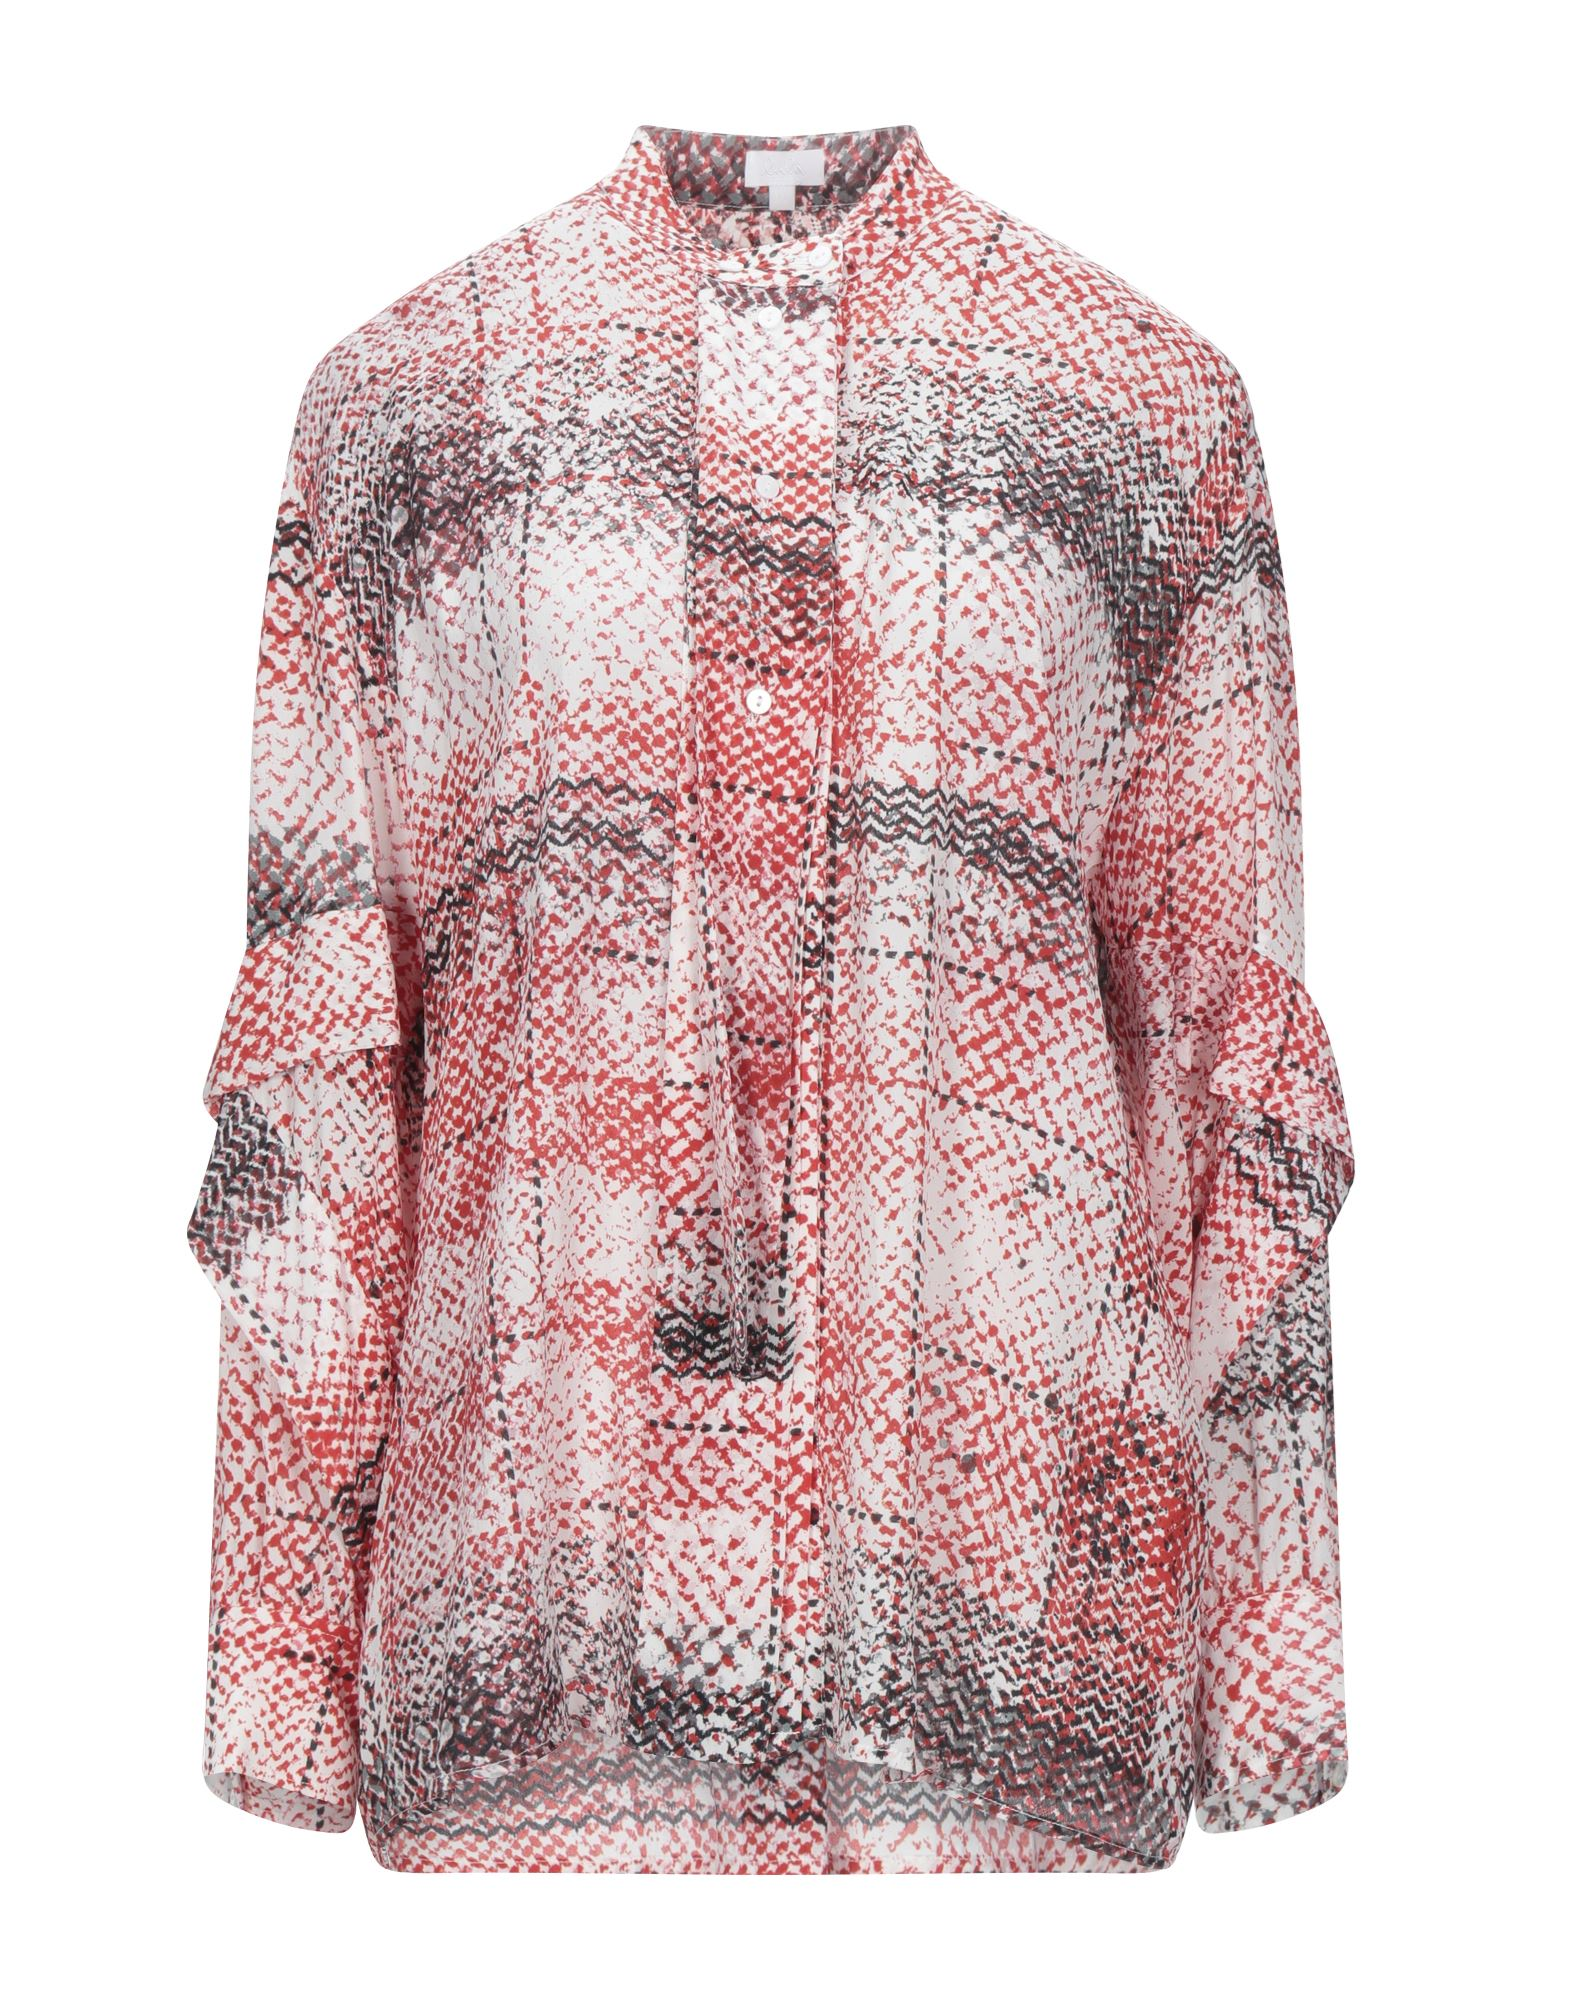 LALA BERLIN Shirts - Item 38950584